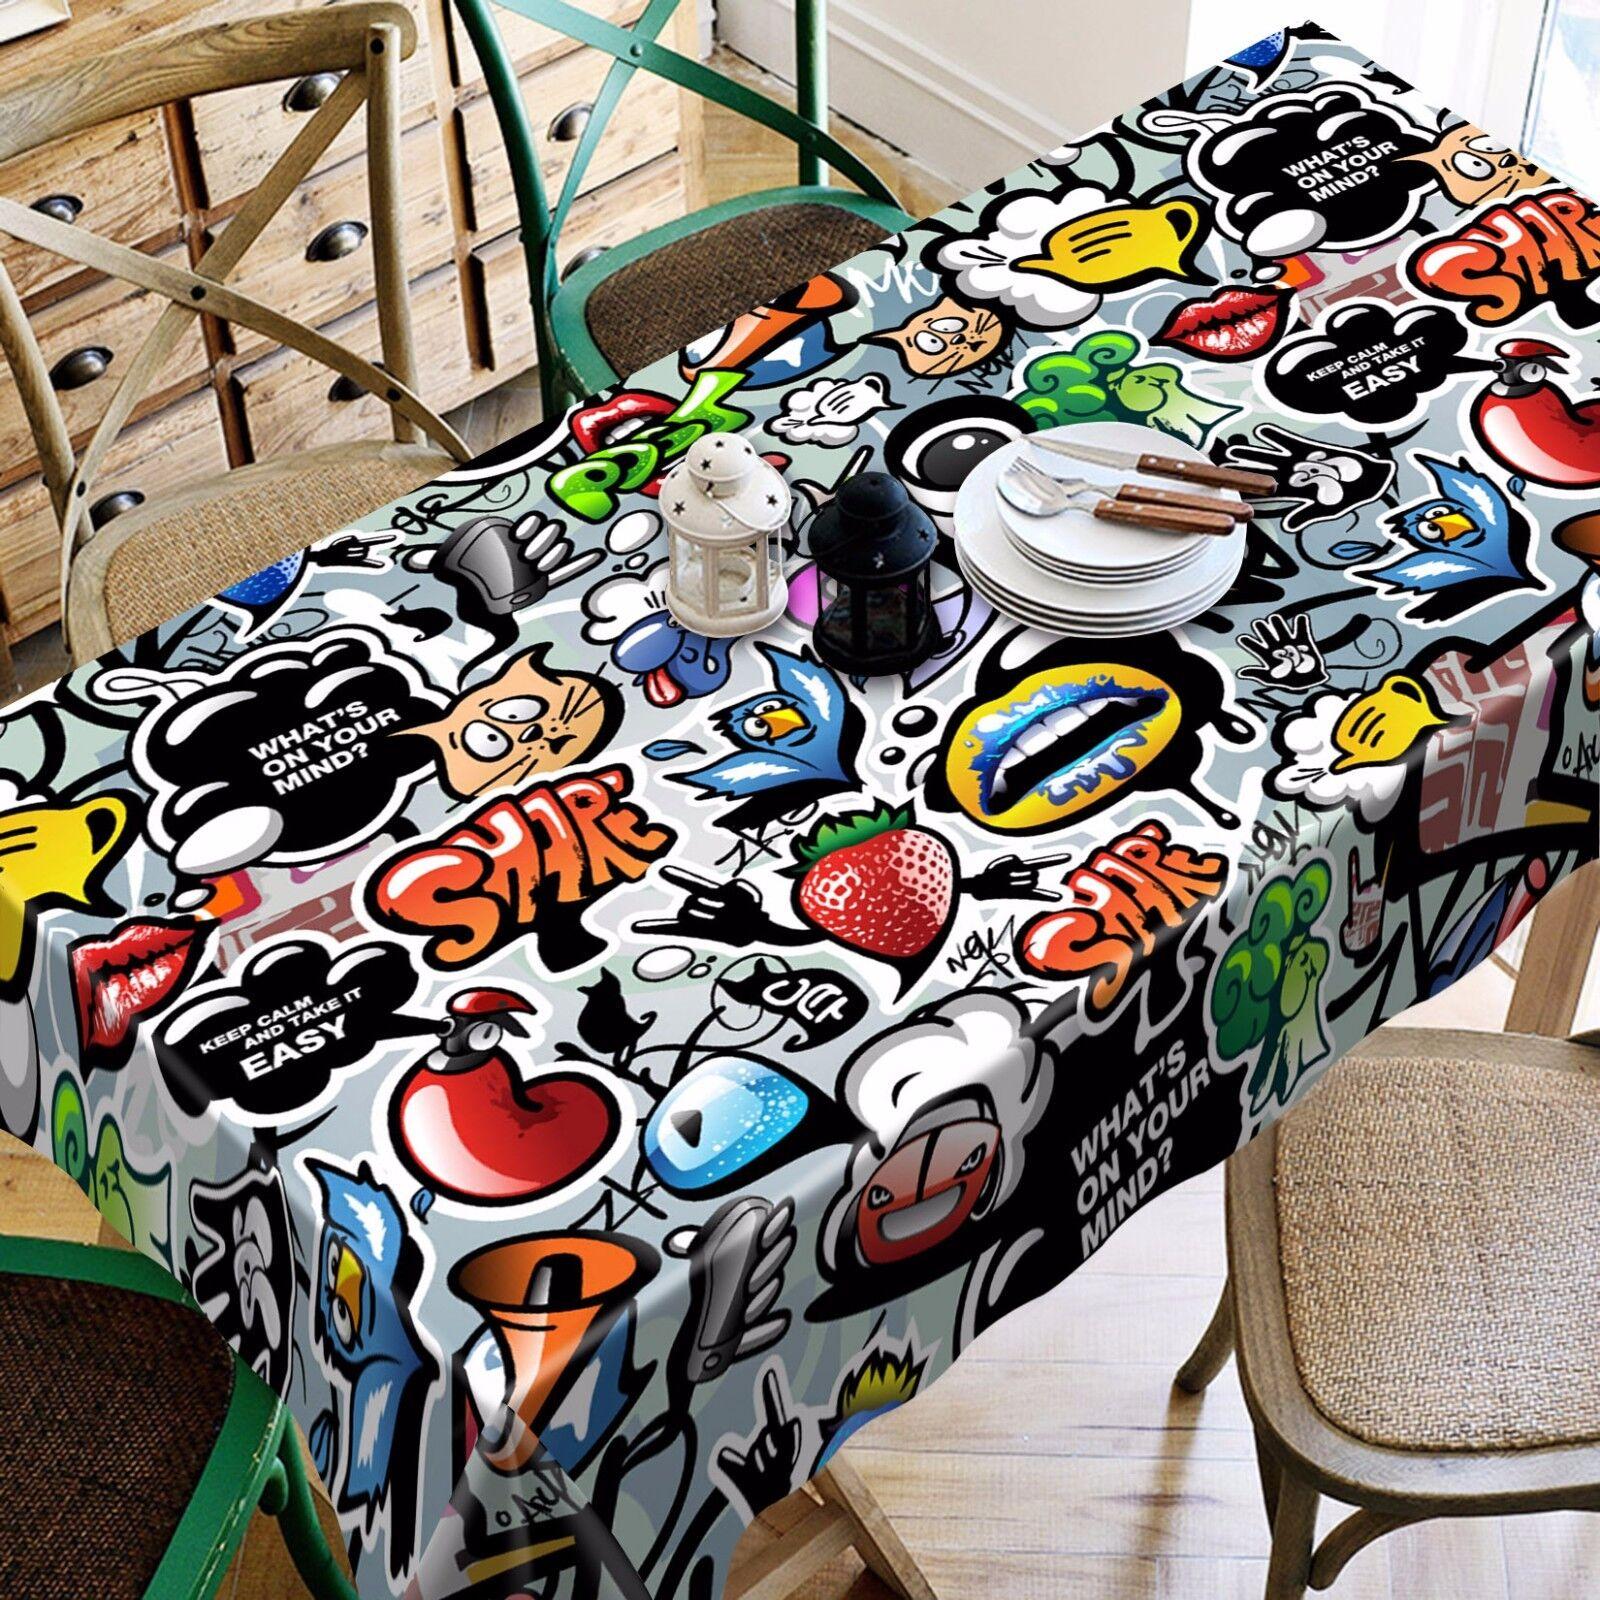 3D Graffiti 5 Tablecloth Table Table Table Cover Cloth Birthday Party AJ WALLPAPER UK Lemon 01bf11